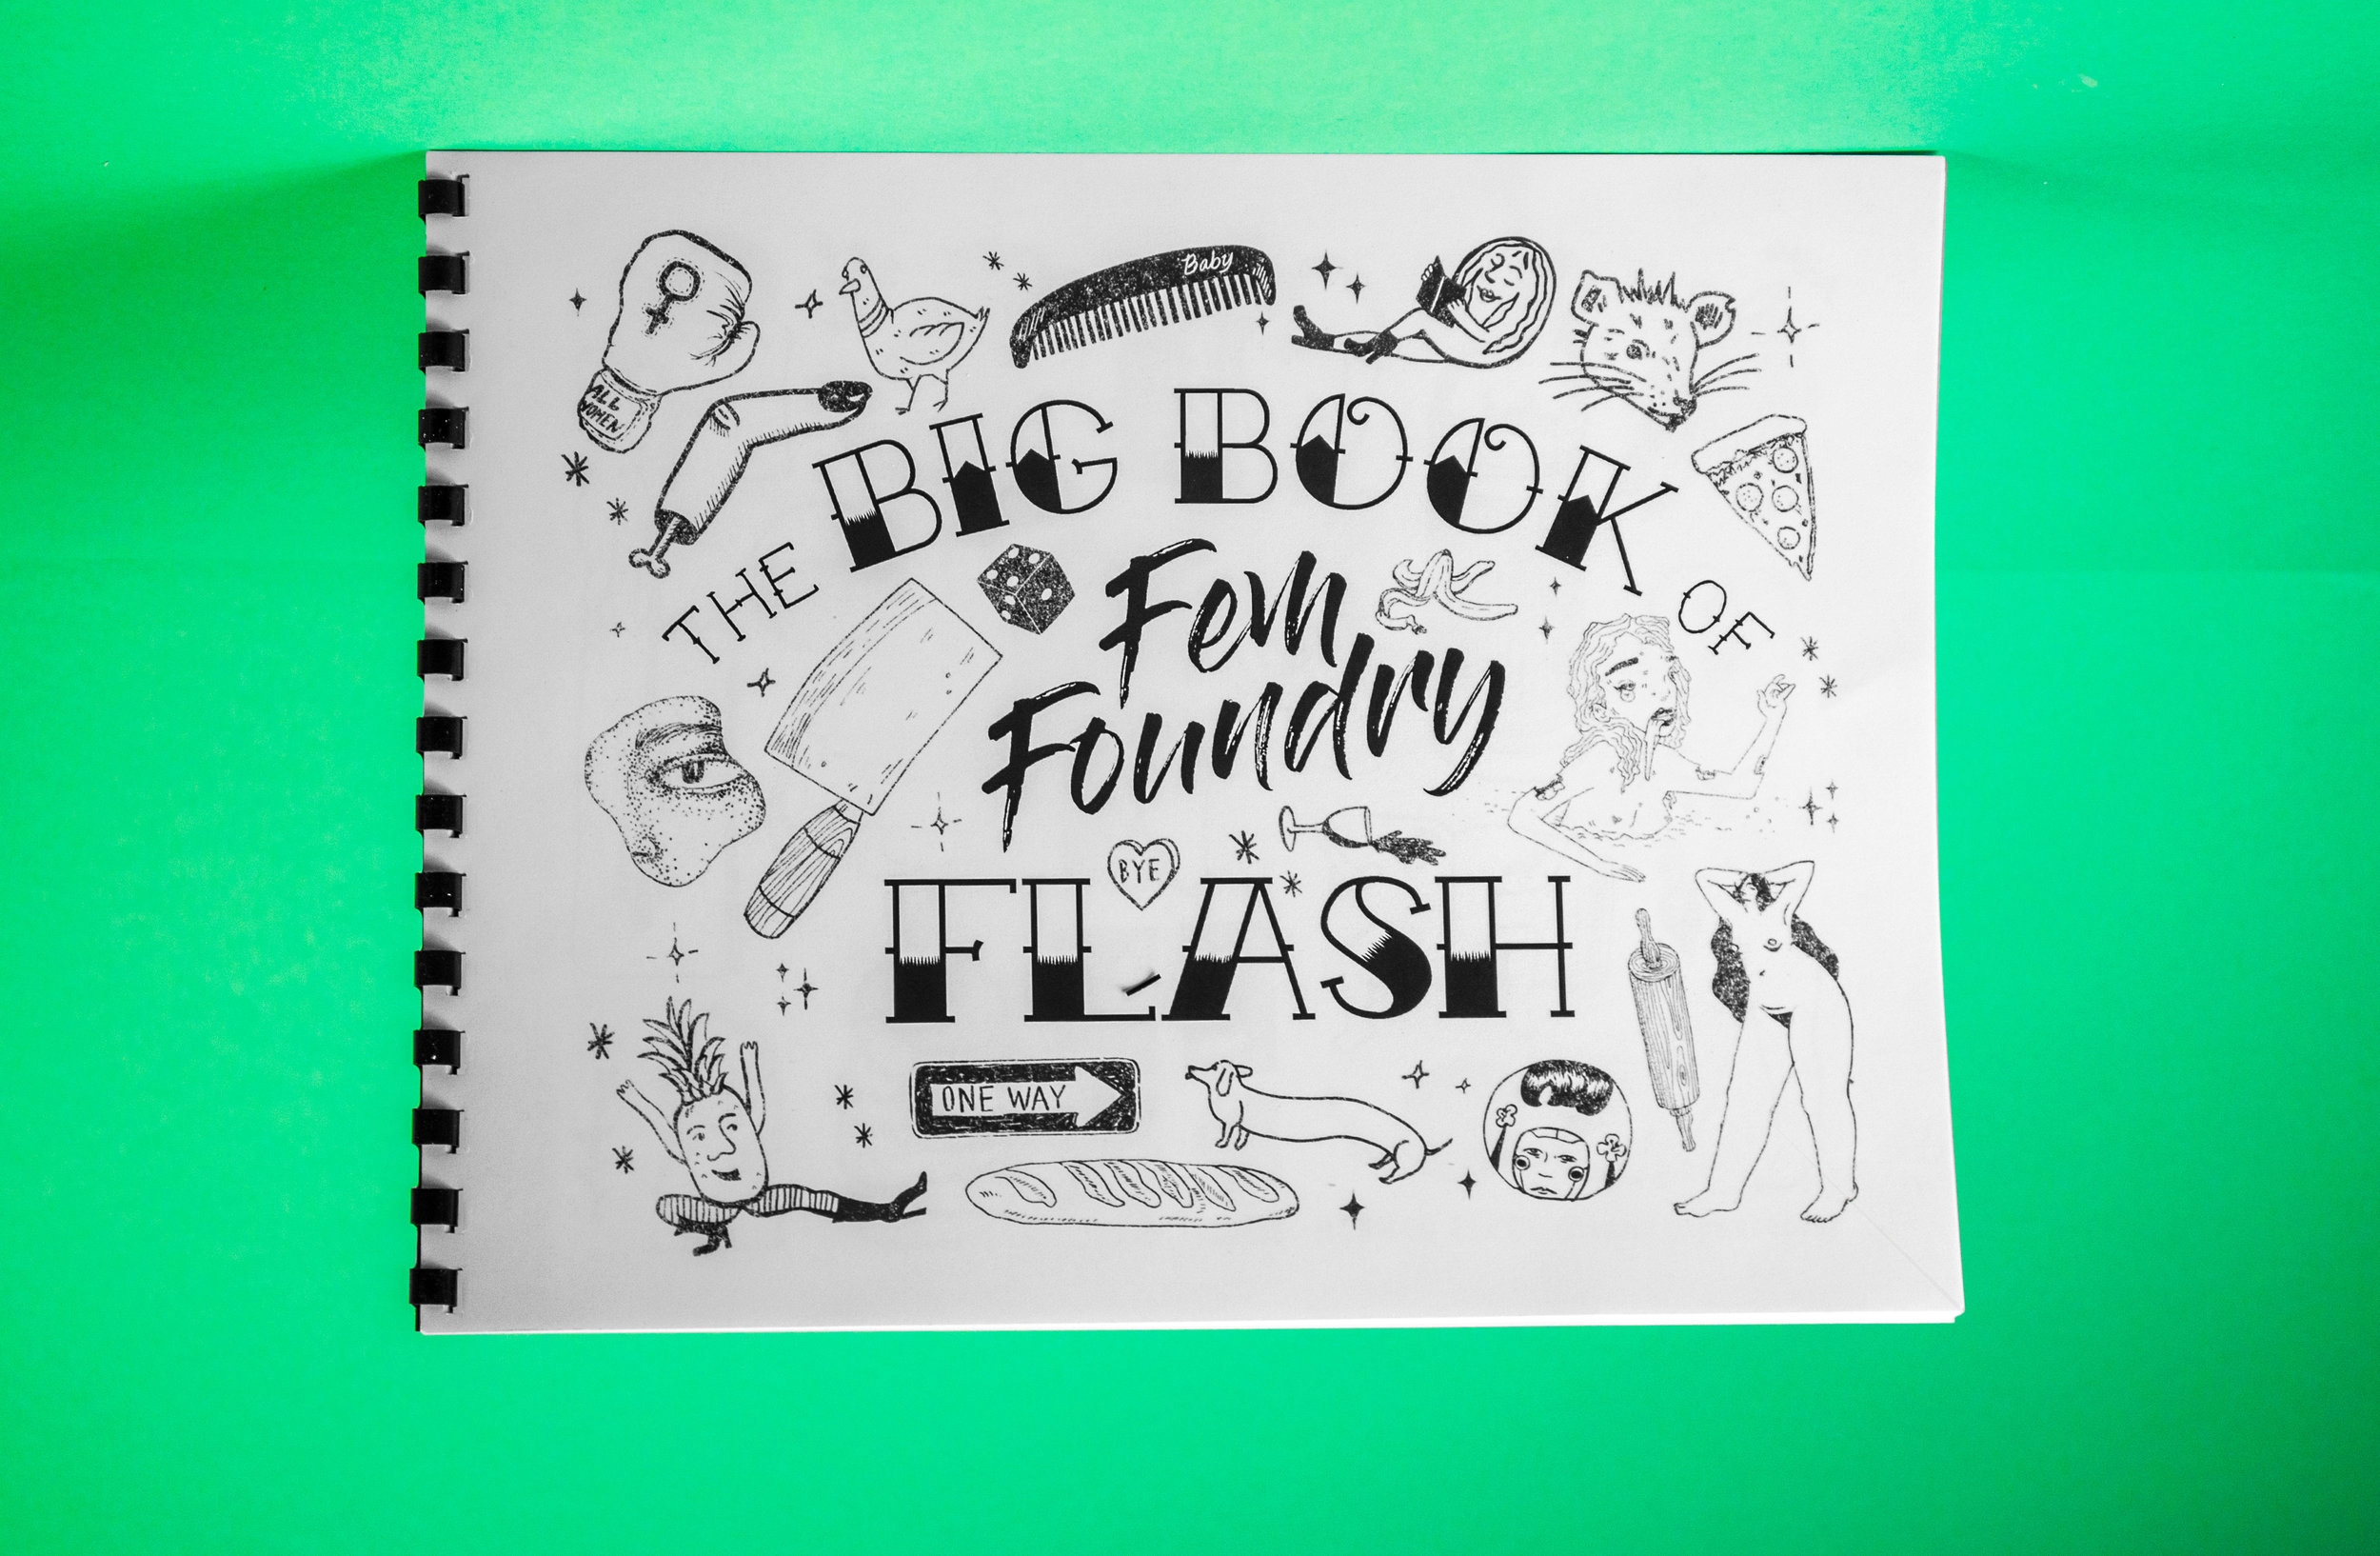 The Big Book of Fem Foundry Flash